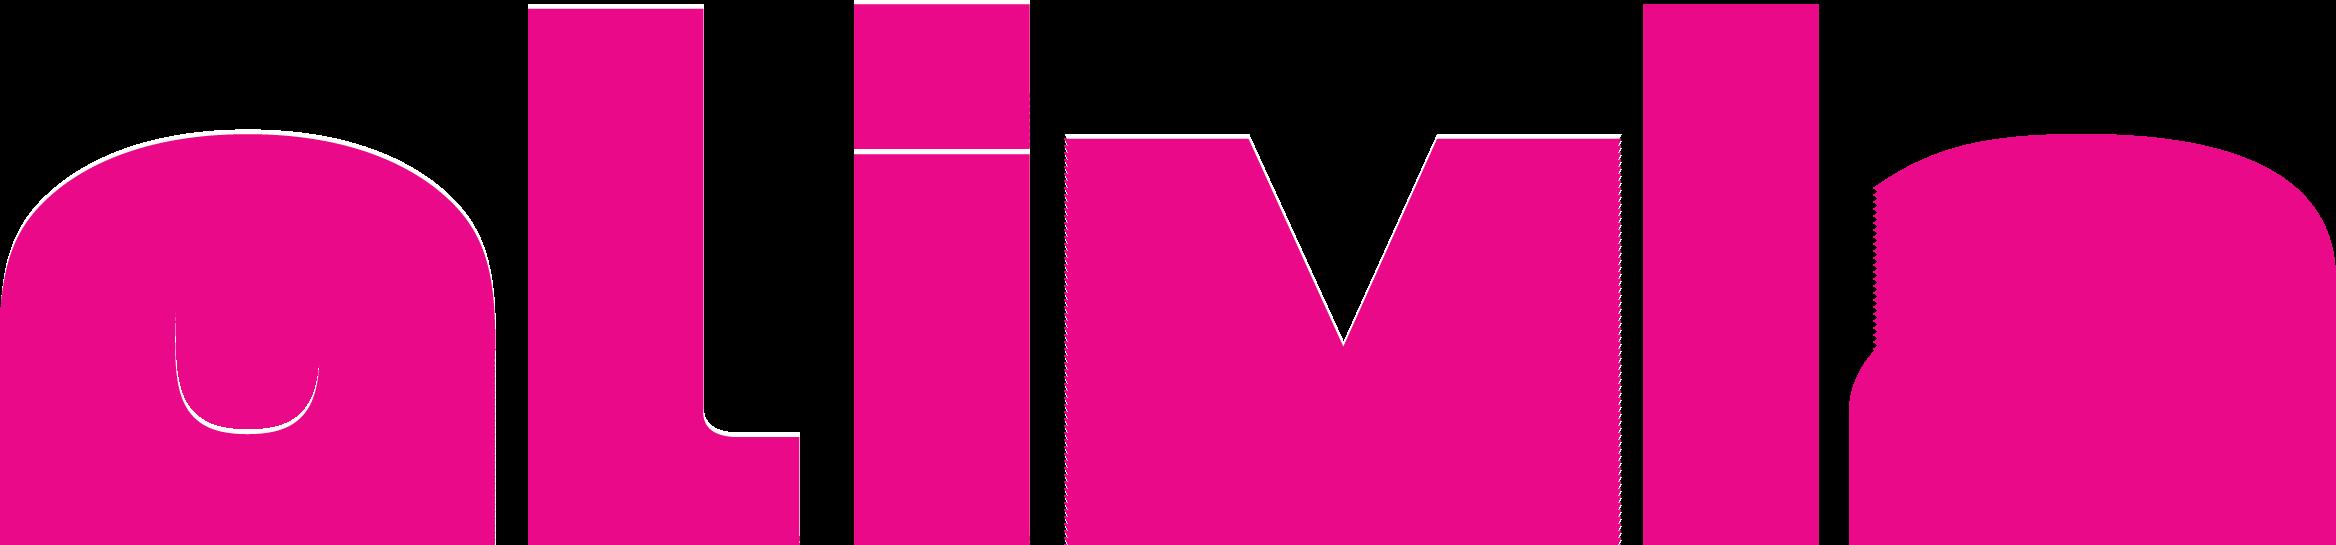 logo krzywe olivia